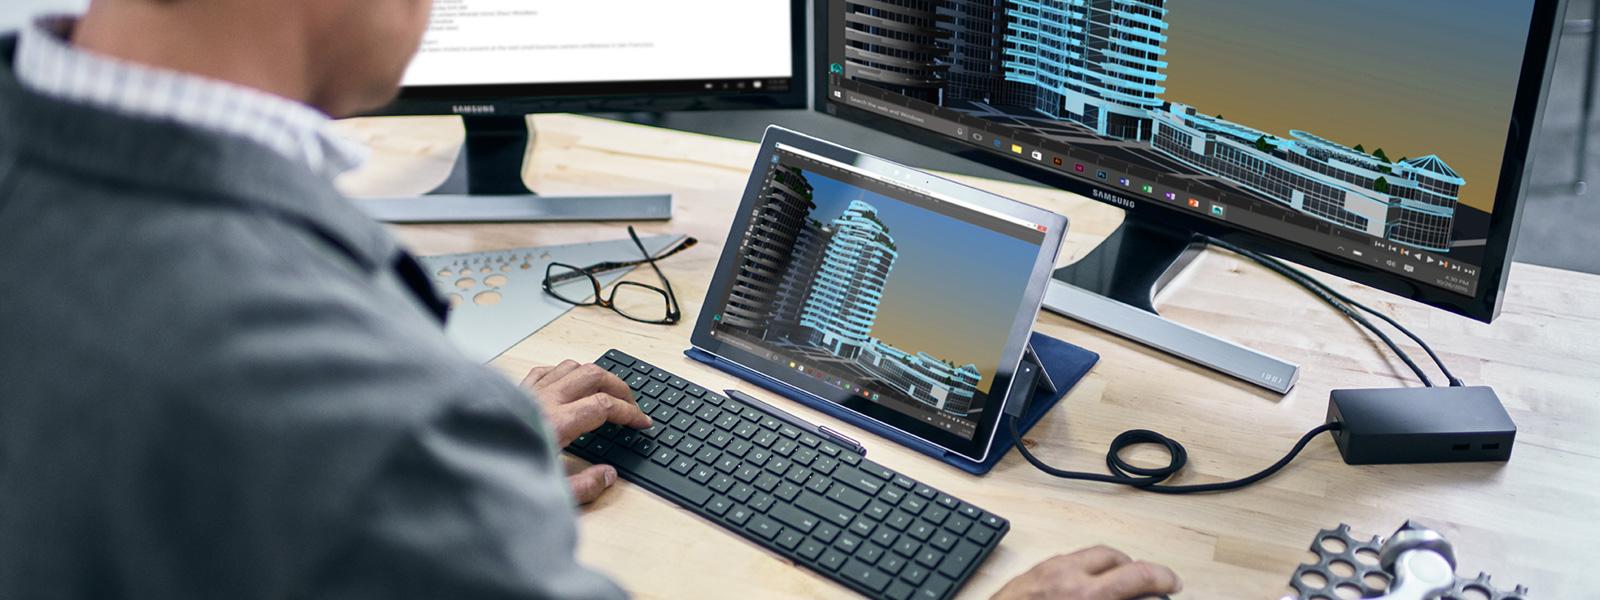 Surface Pro 4, grote monitor en toetsenbord geplaatst op een bureau.